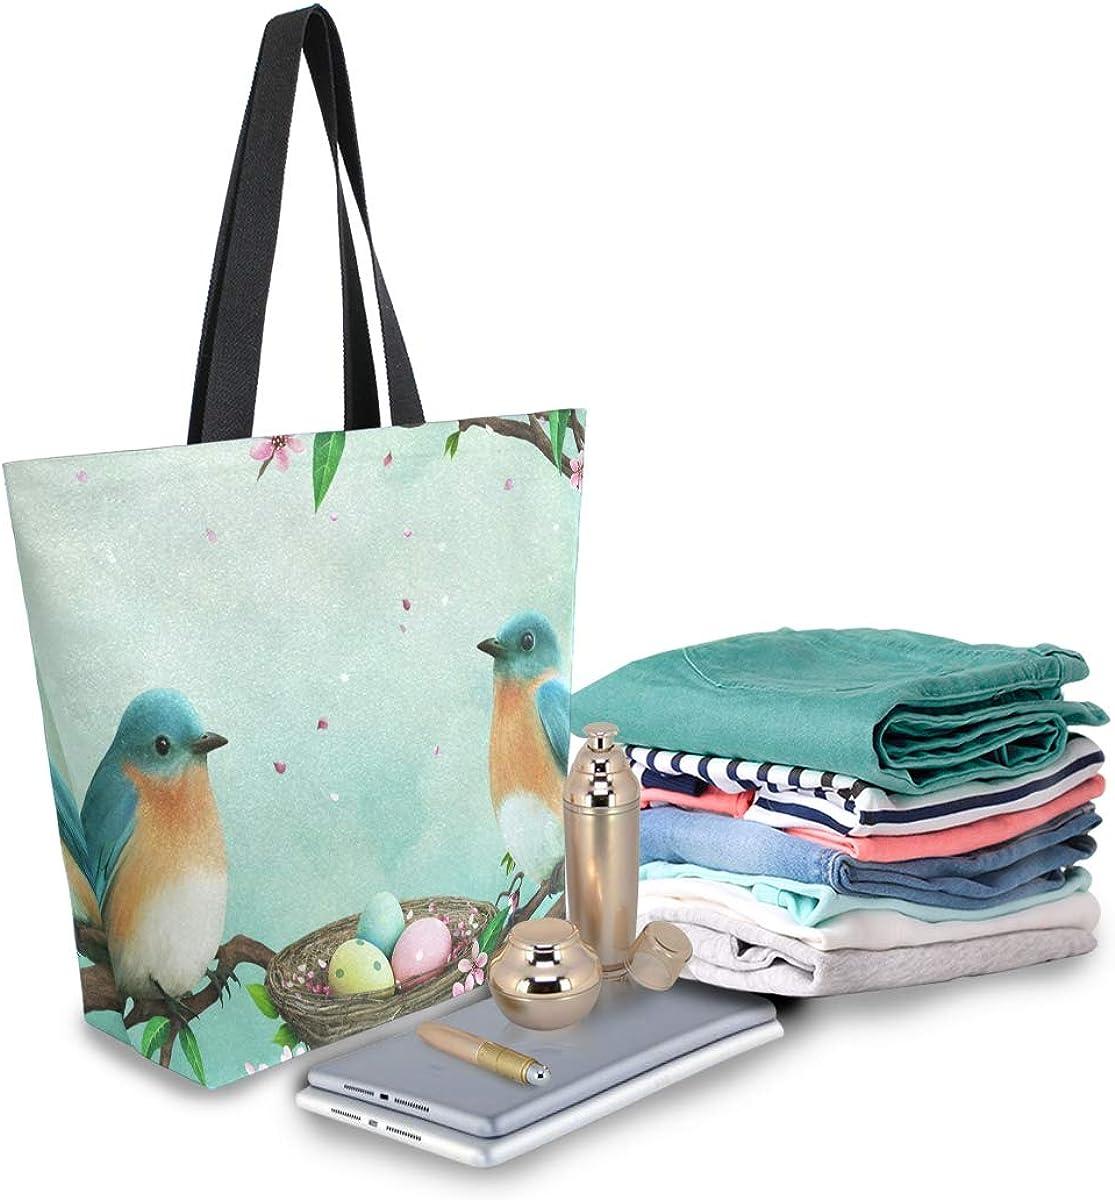 MNSRUU Women's Canvas Tote Easter Eggs Bird On Tree 373361848 Shoulder Bag Stylish, Shopping Casual Bag Foldaway Travel Bag